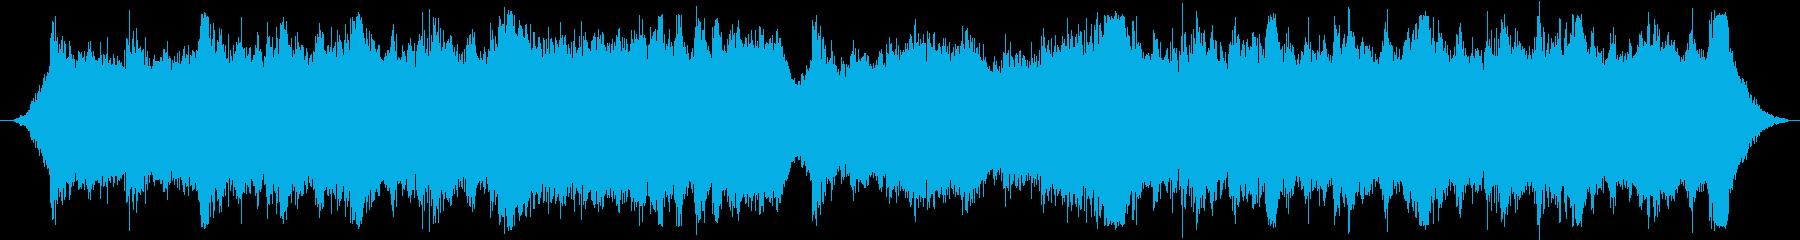 RPGの戦闘シーンにぴったりのフルオケ曲の再生済みの波形